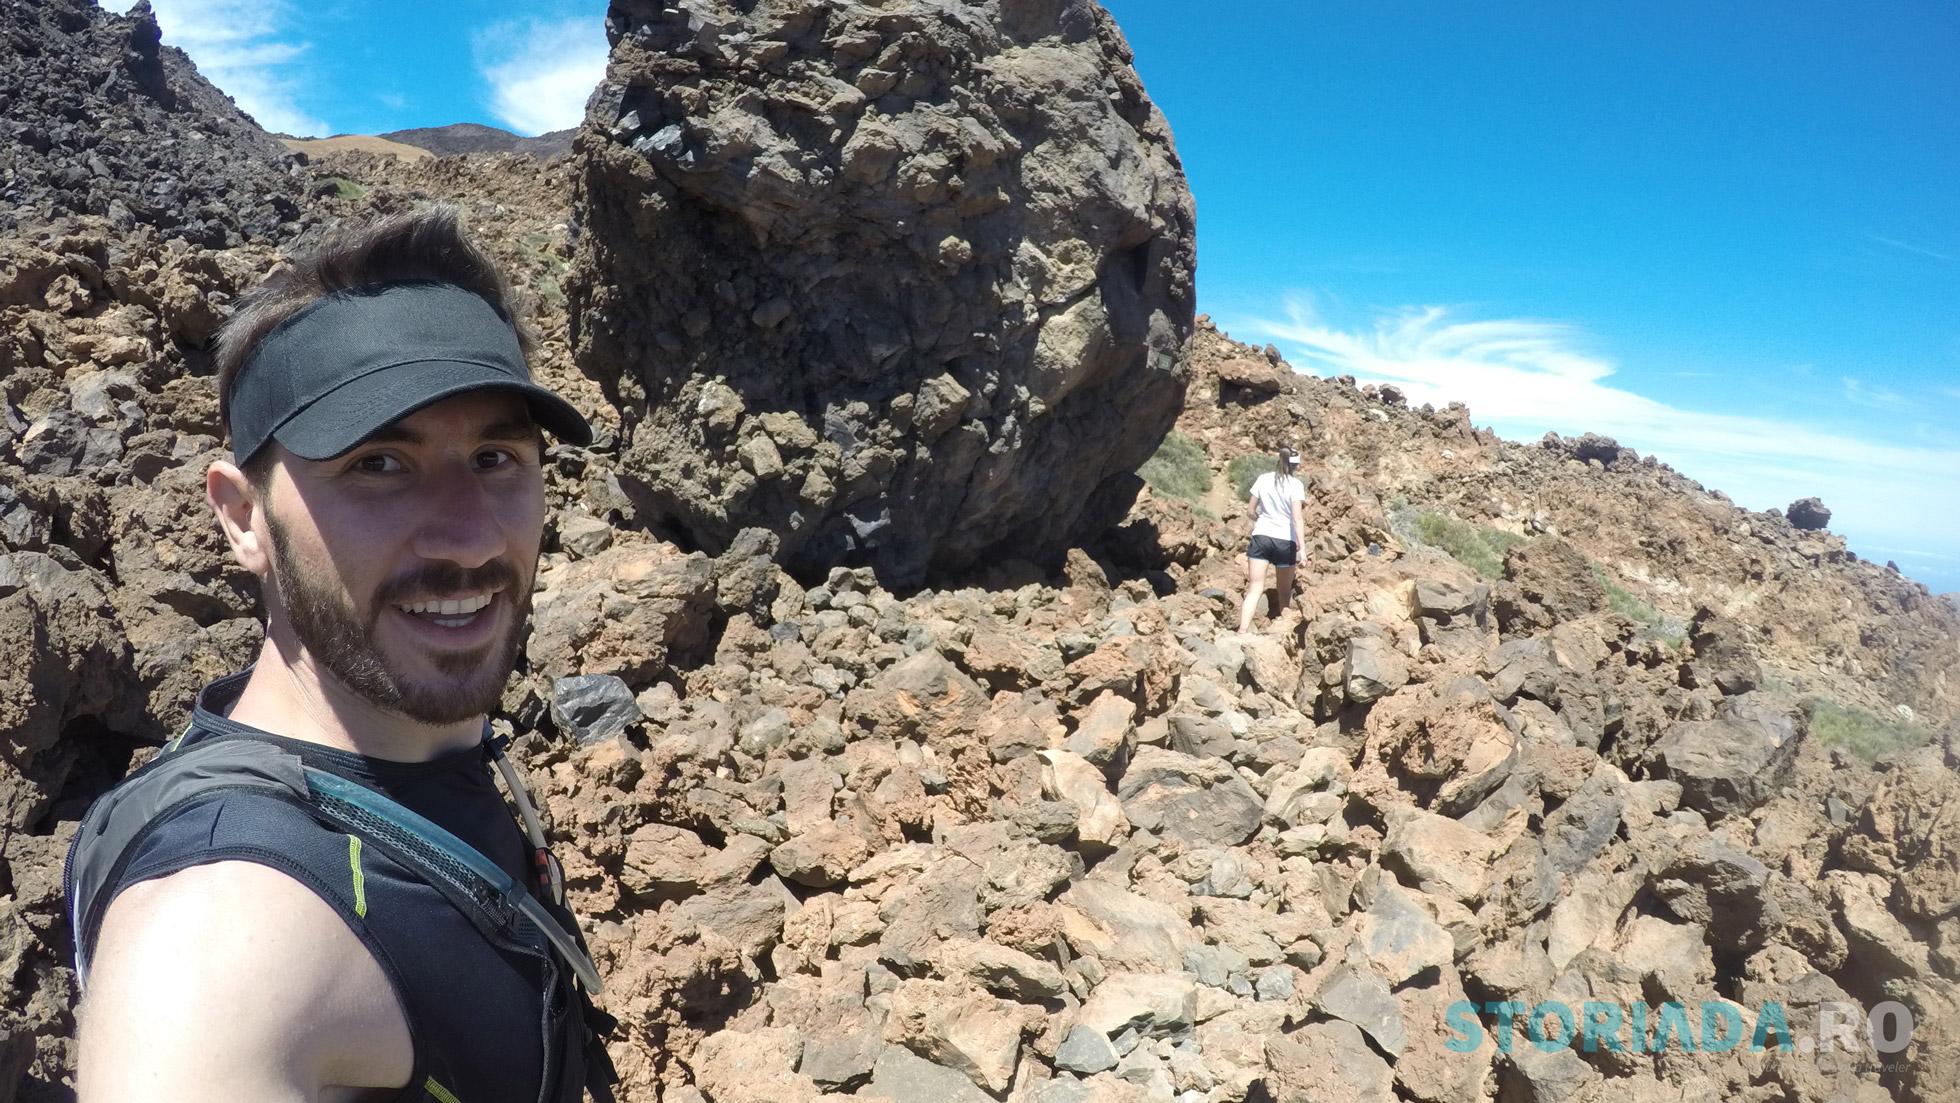 Tenerife, El Teide, Trail Running